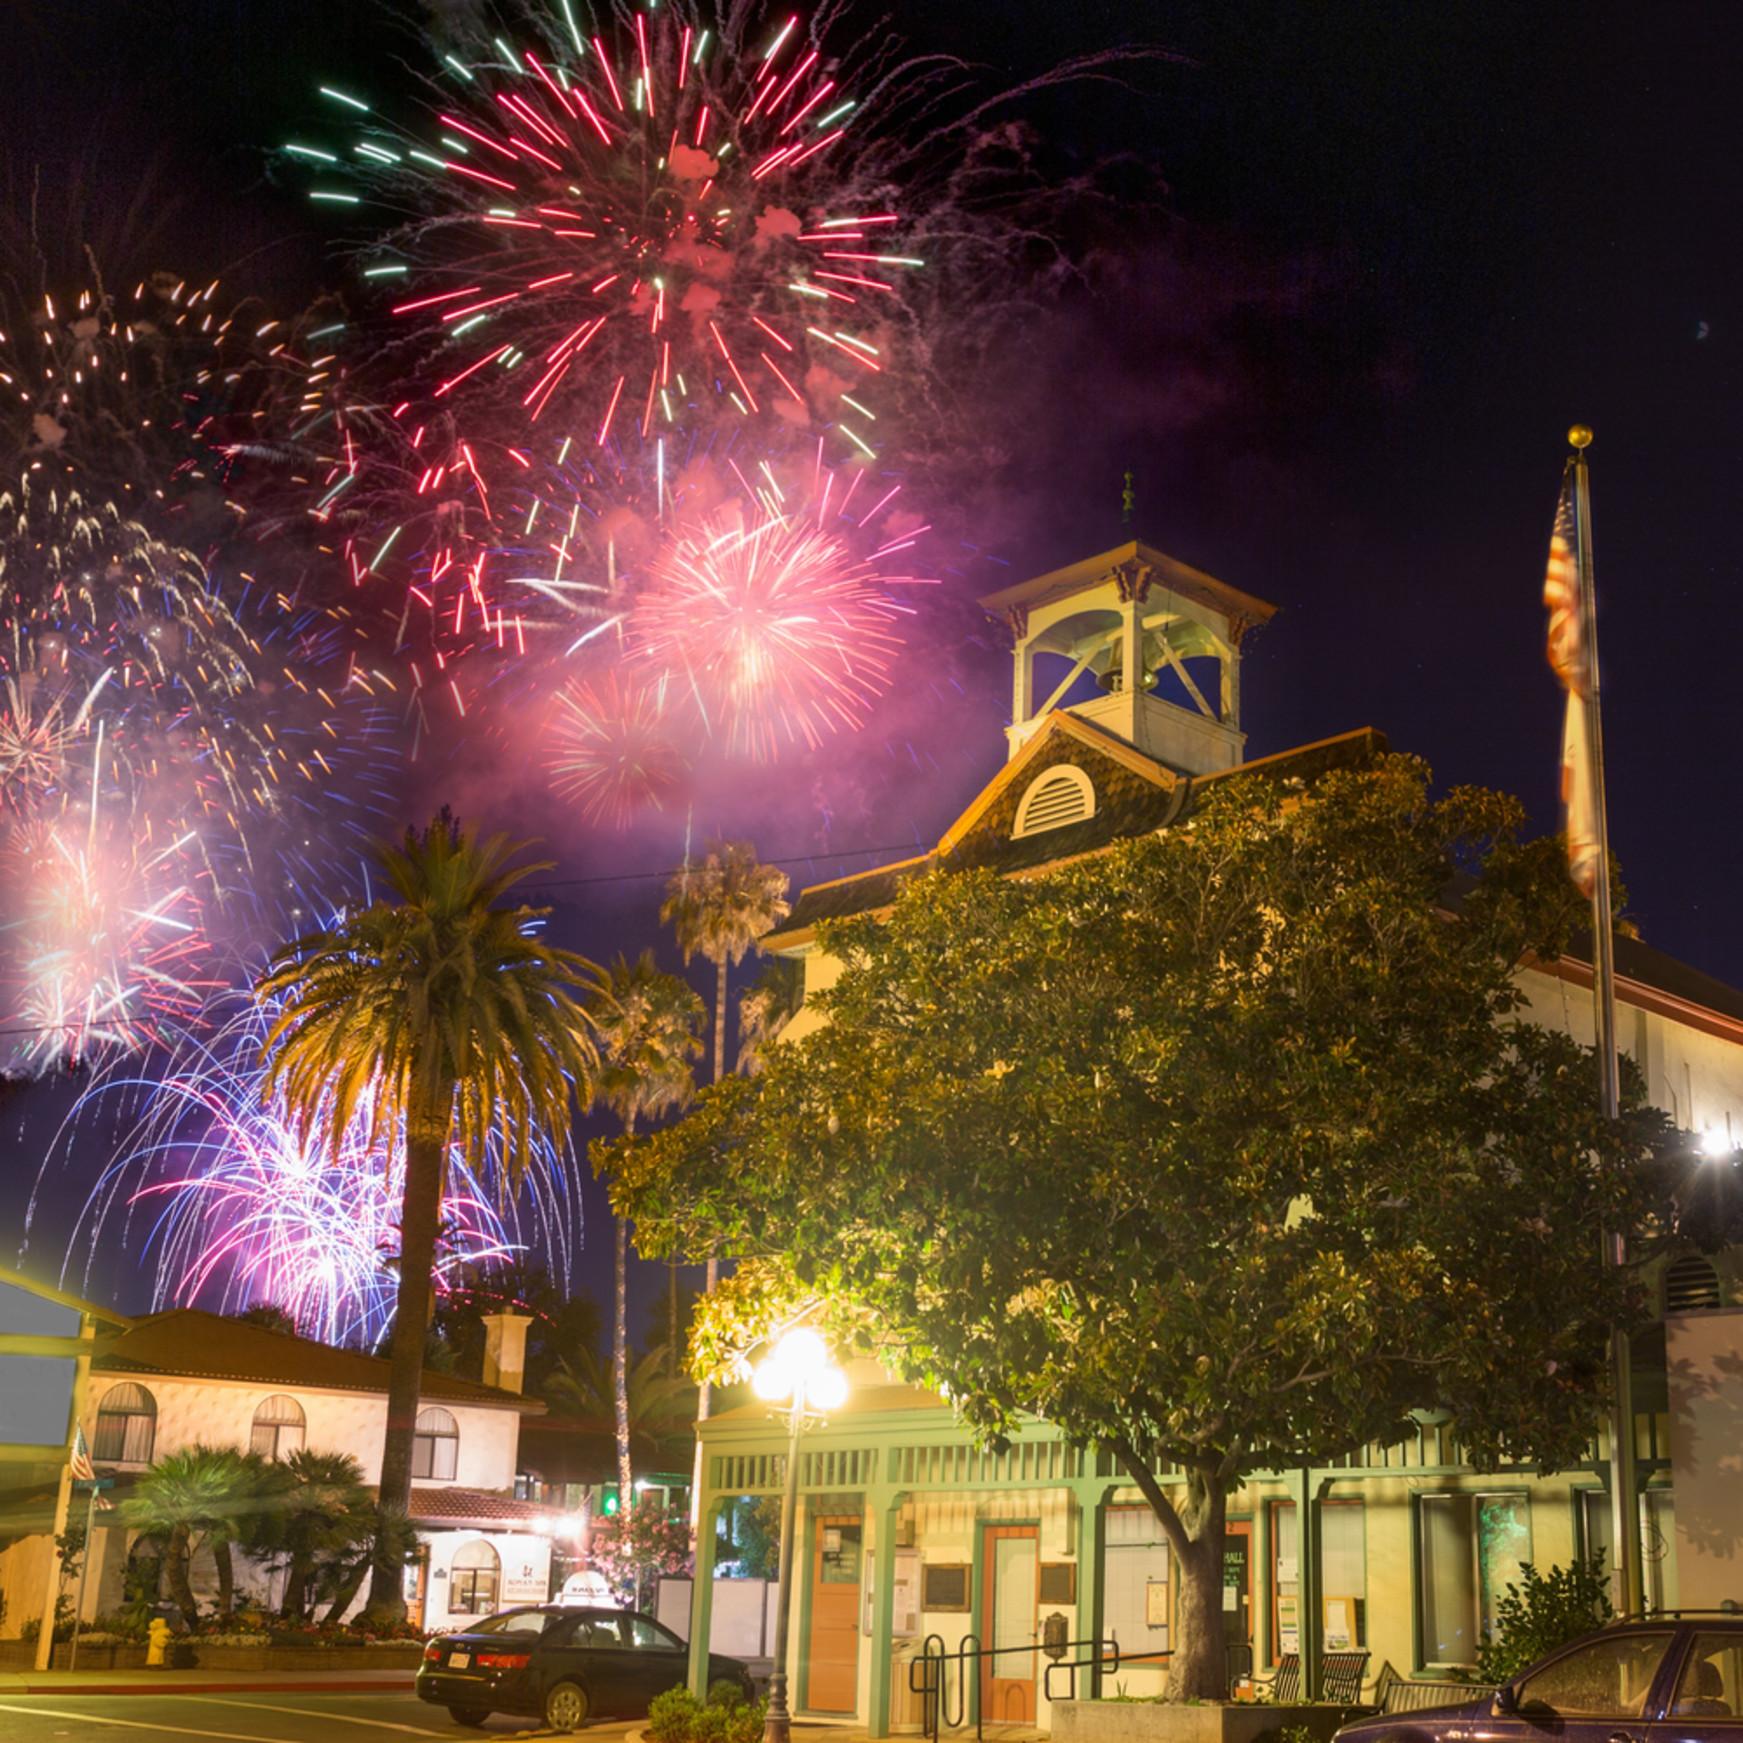 Fireworks at town hall calistoga p8oggp